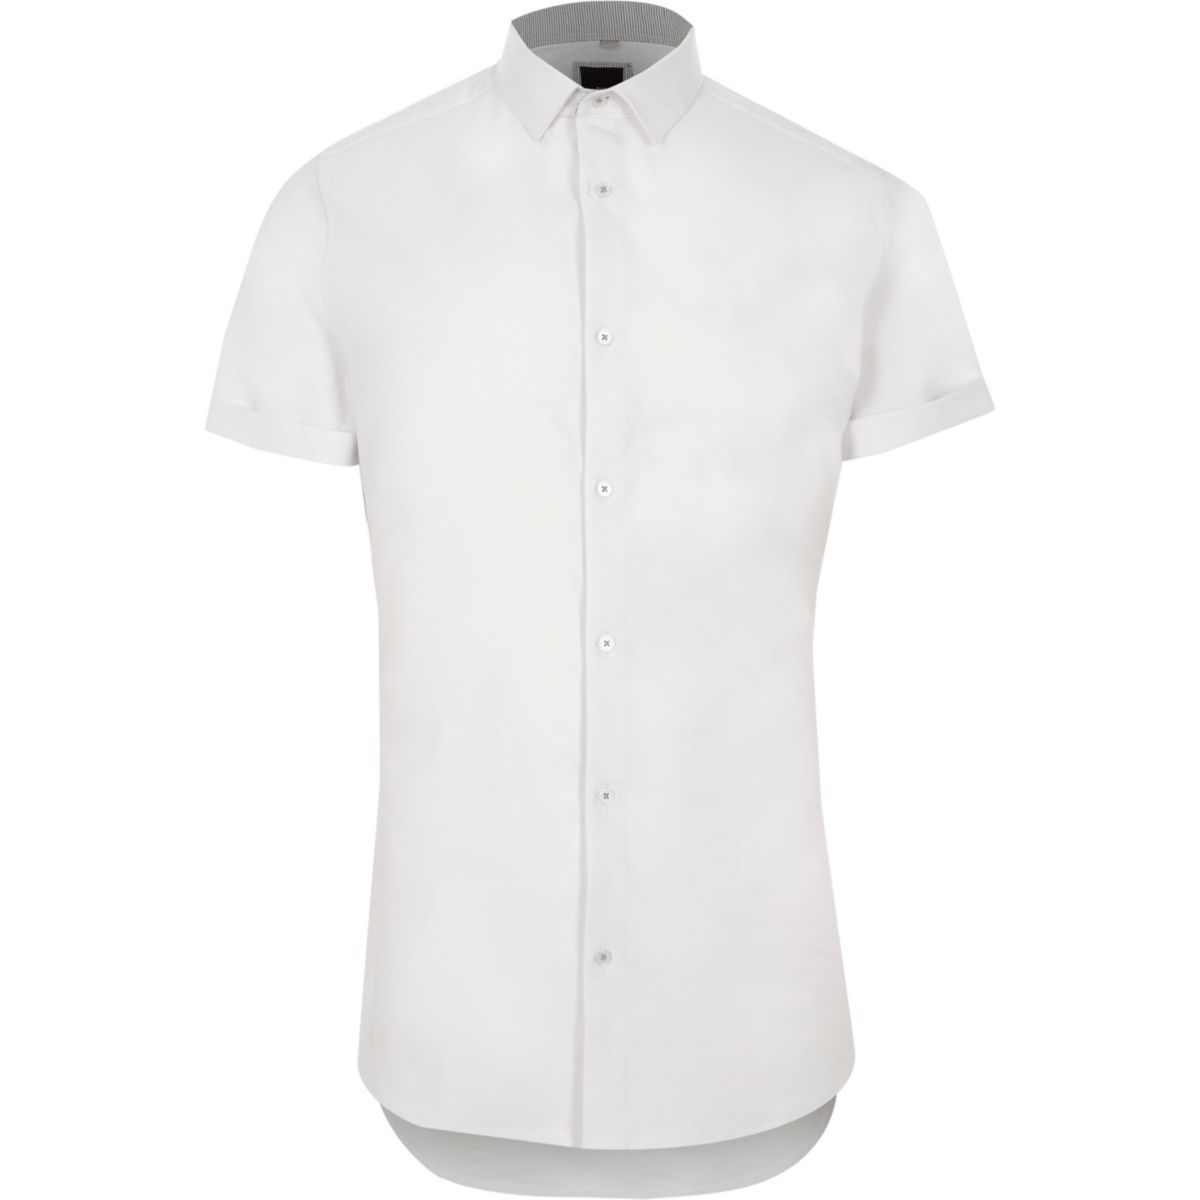 White textured skinny fit short sleeve shirt